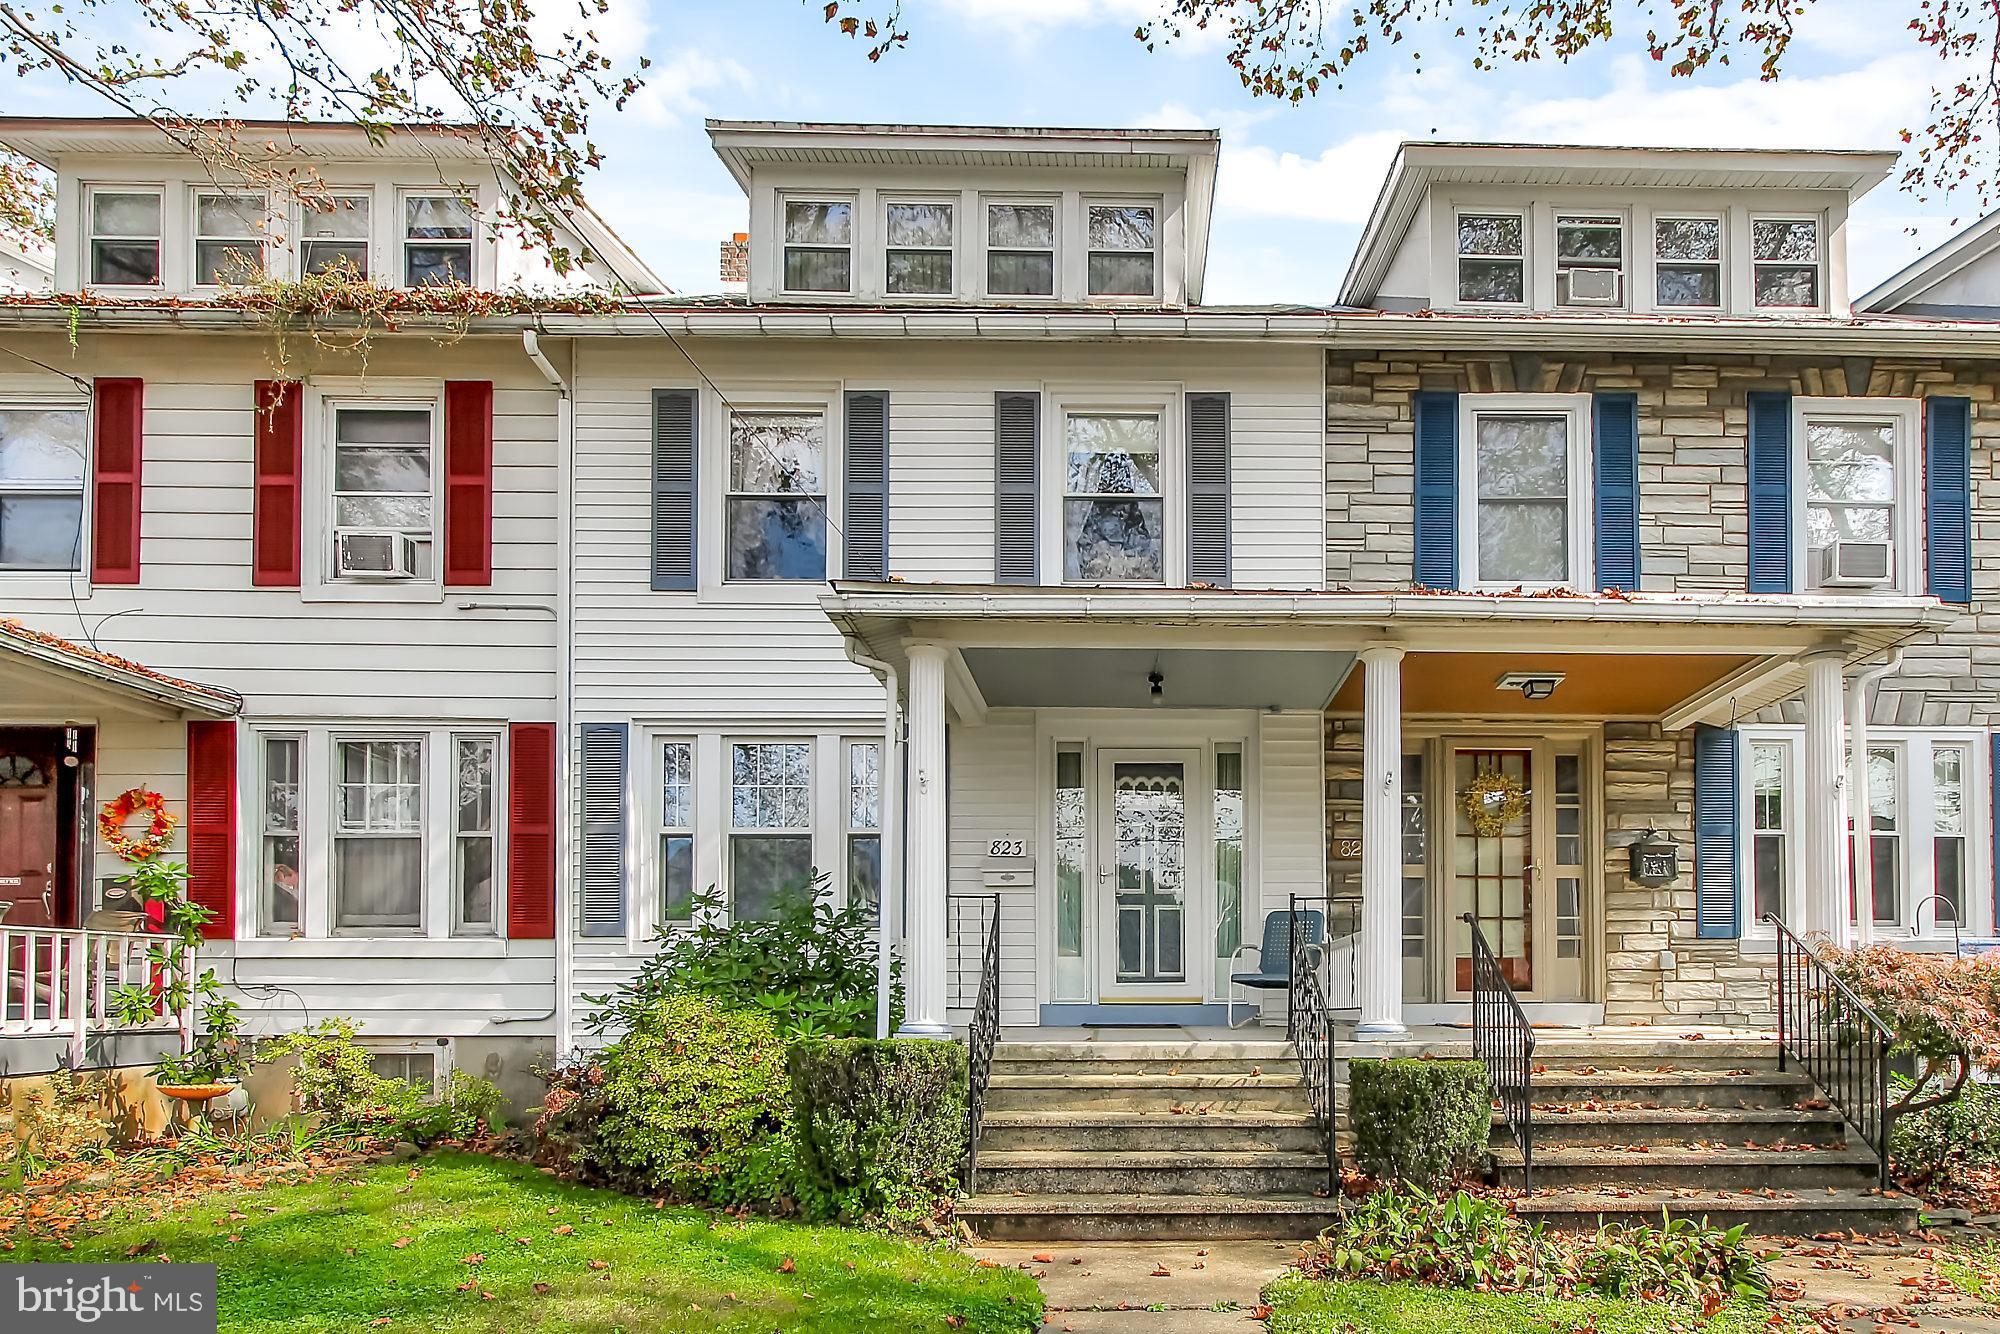 823 MAIN STREET, SHOEMAKERSVILLE, PA 19555